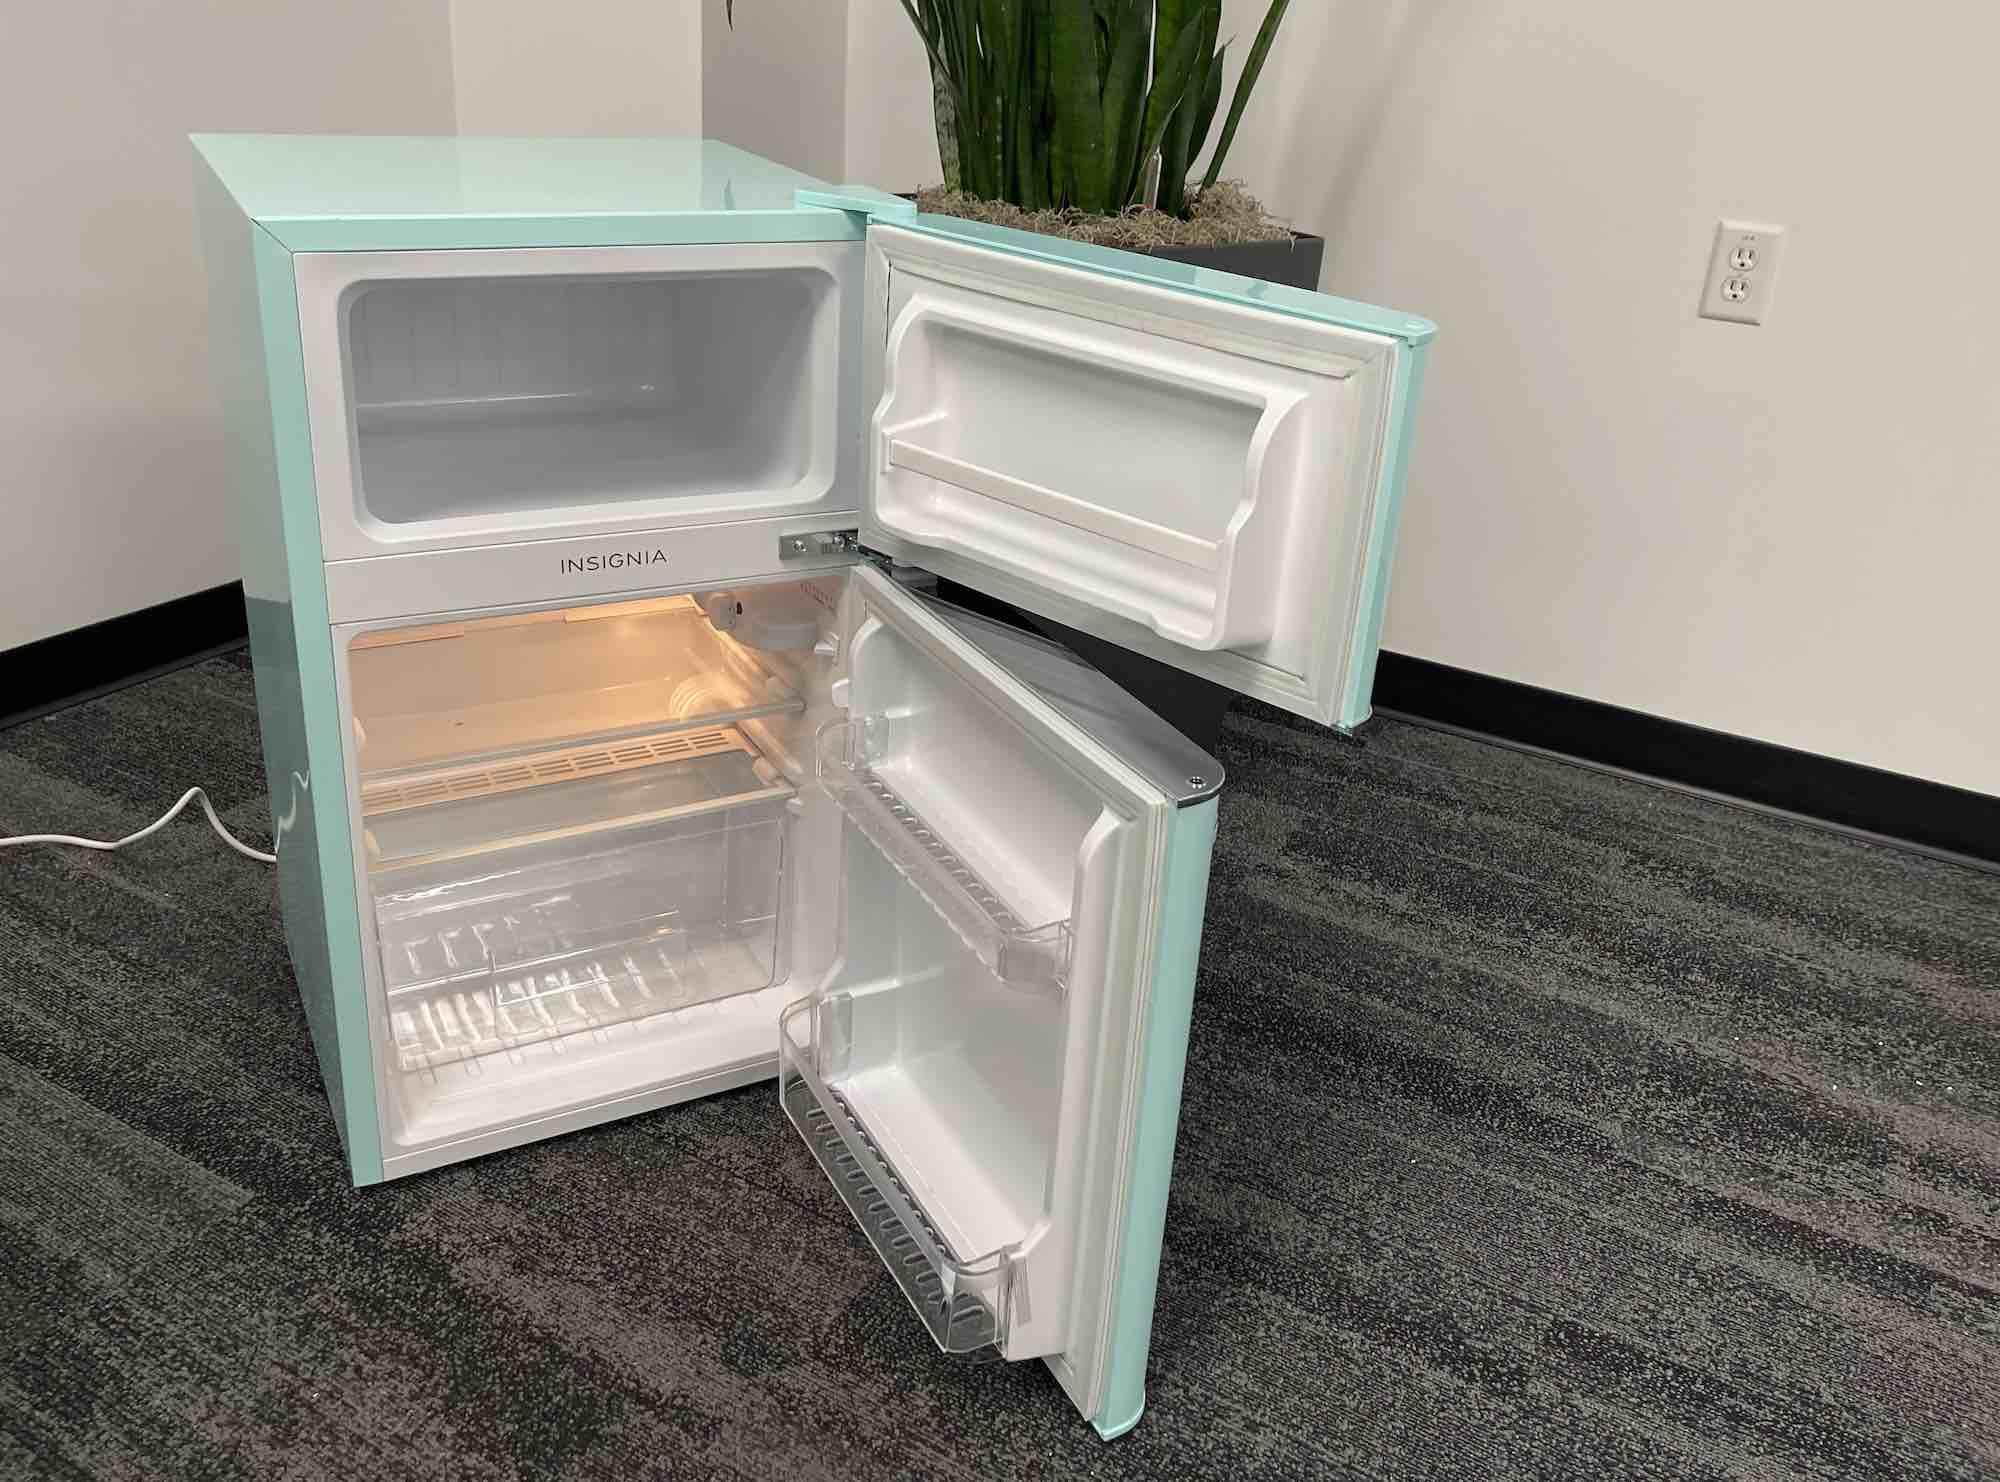 Insignia retro fridge with top freezer